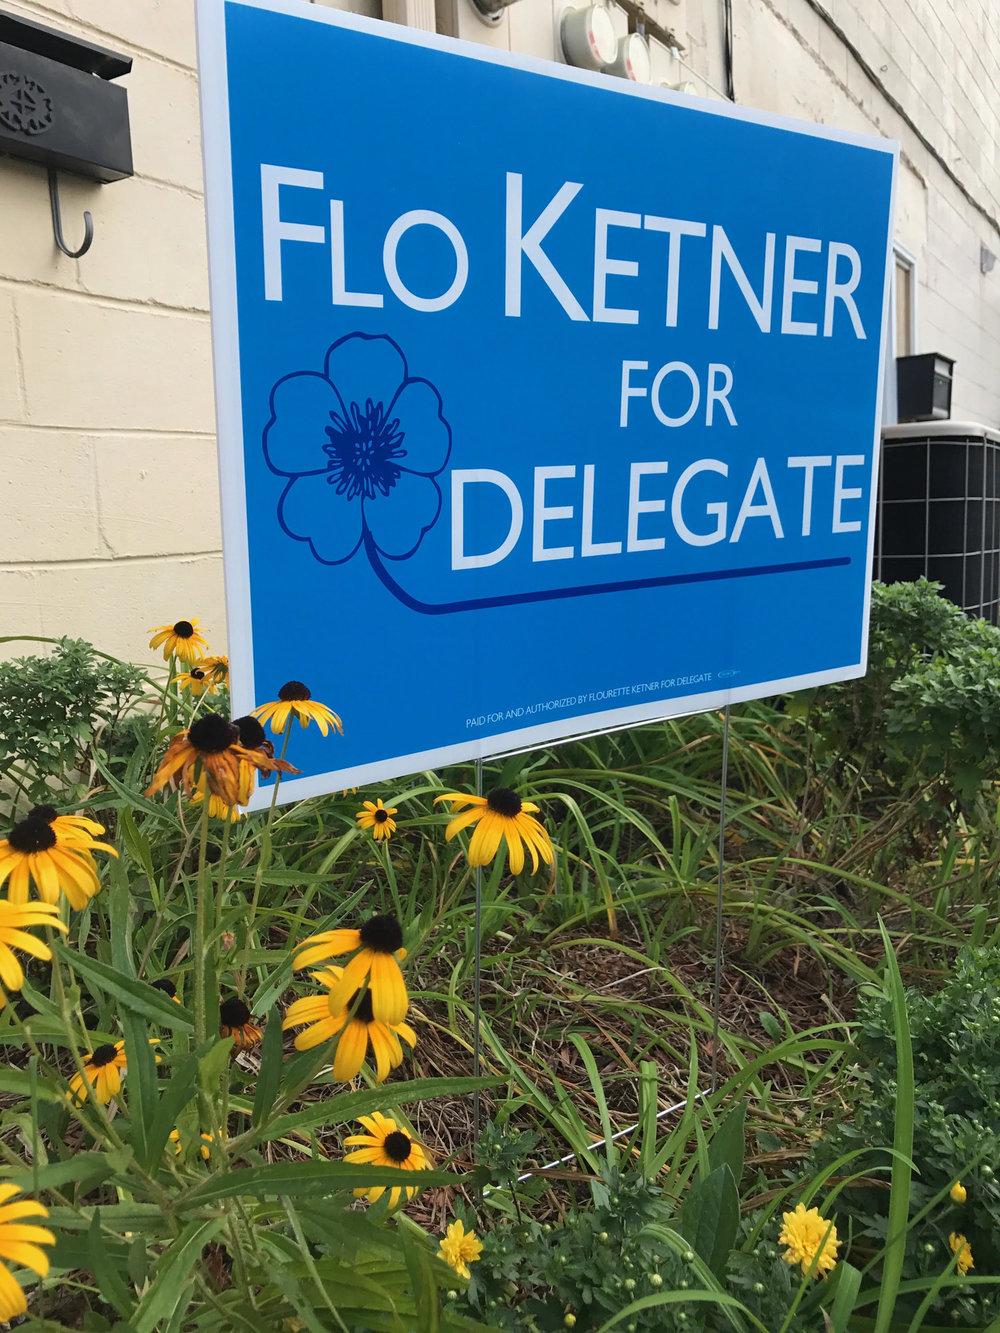 Flo+Ketner+for+Delegate.jpeg